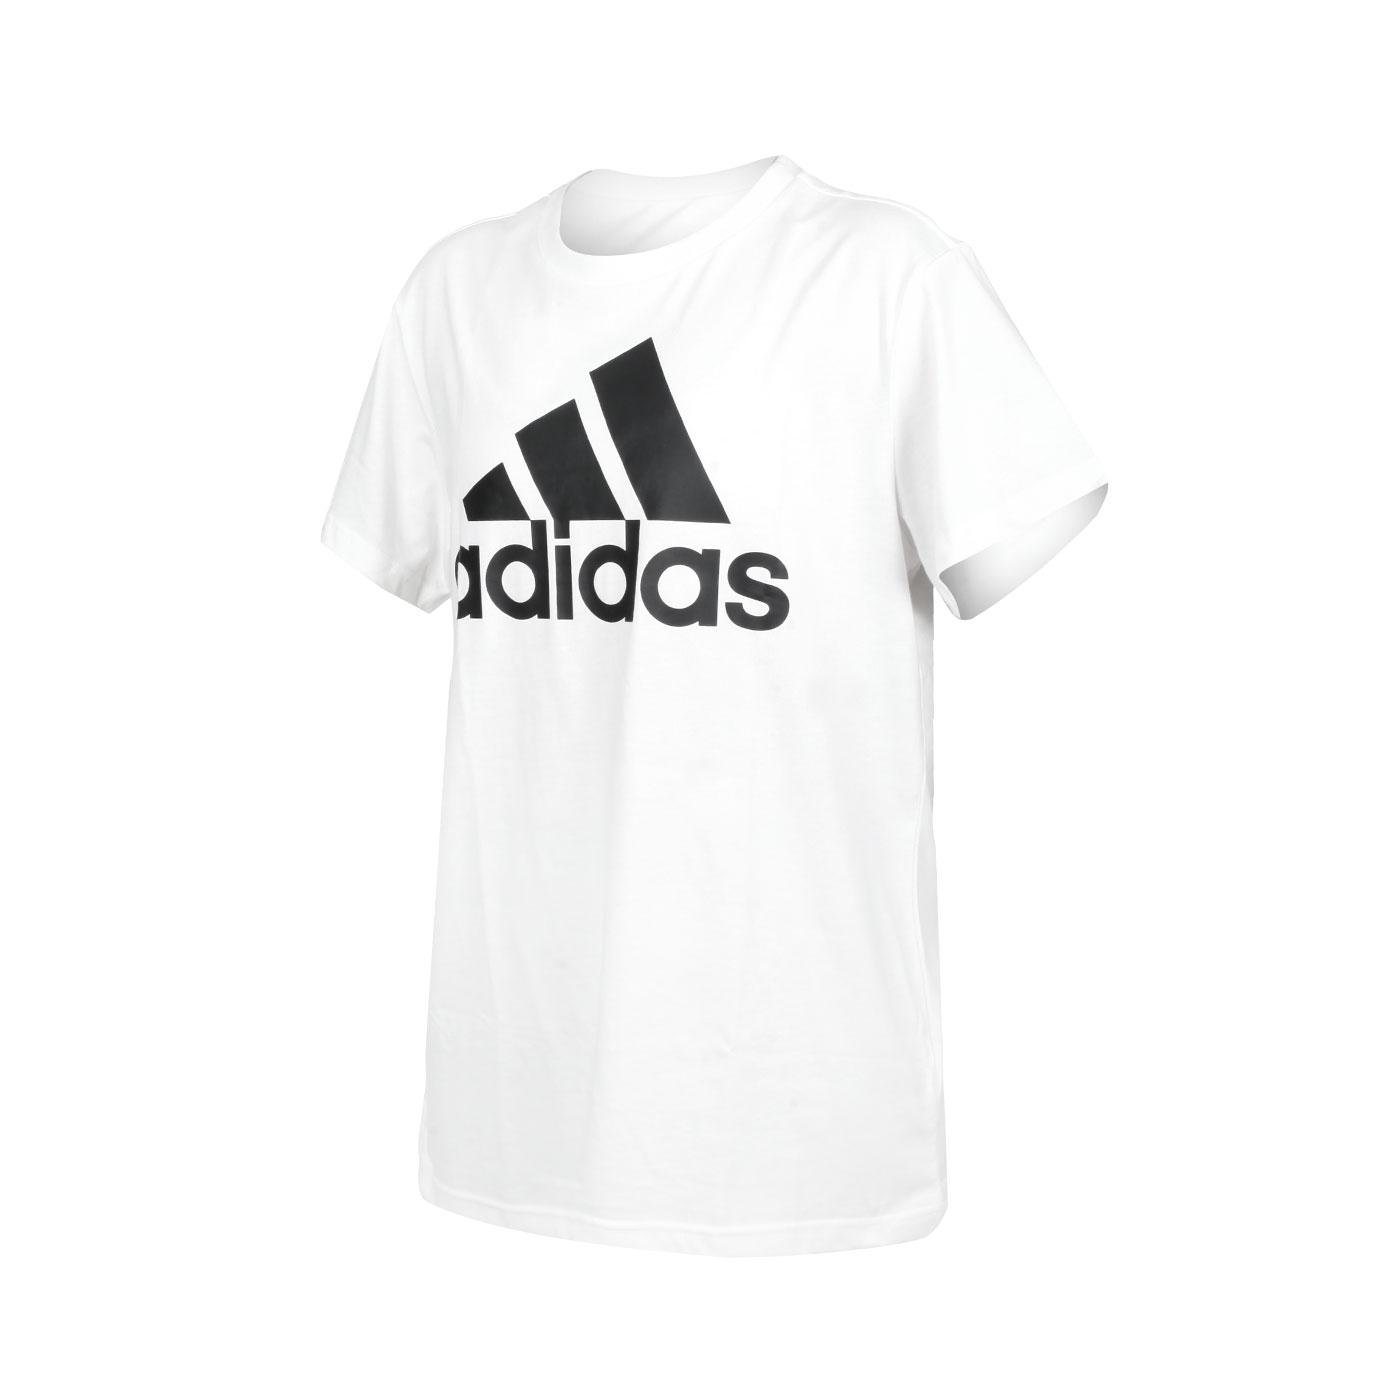 ADIDAS 女款短袖T恤 GL0779 - 白黑